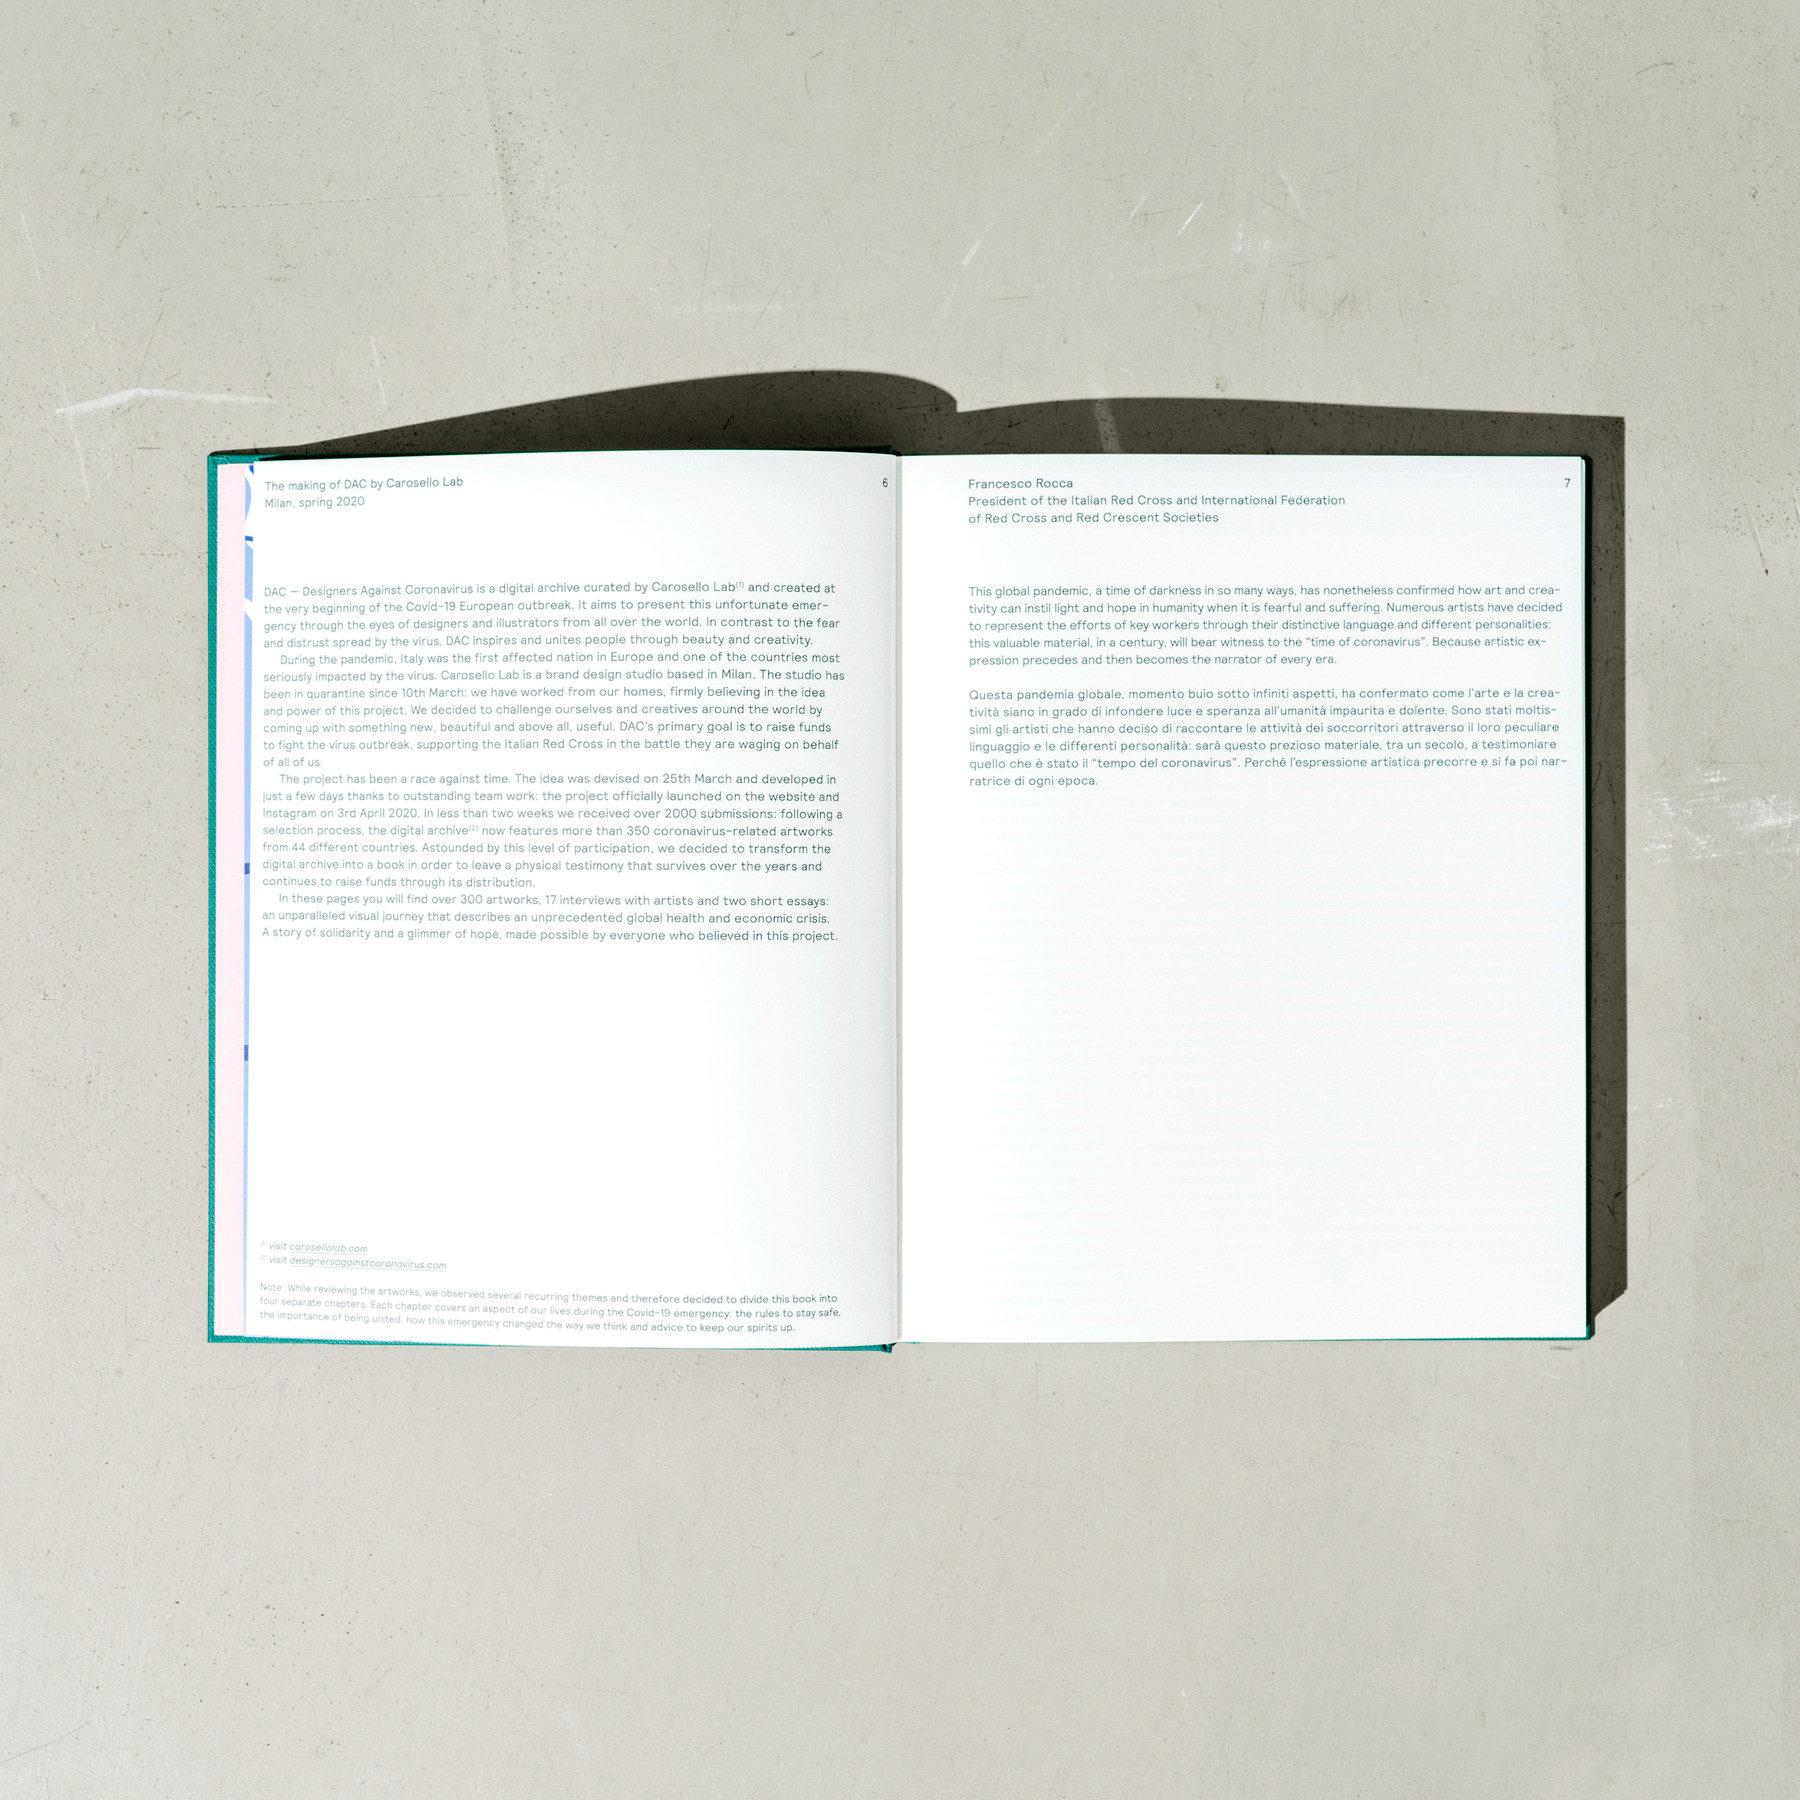 DAC Book CaroselloLab 020